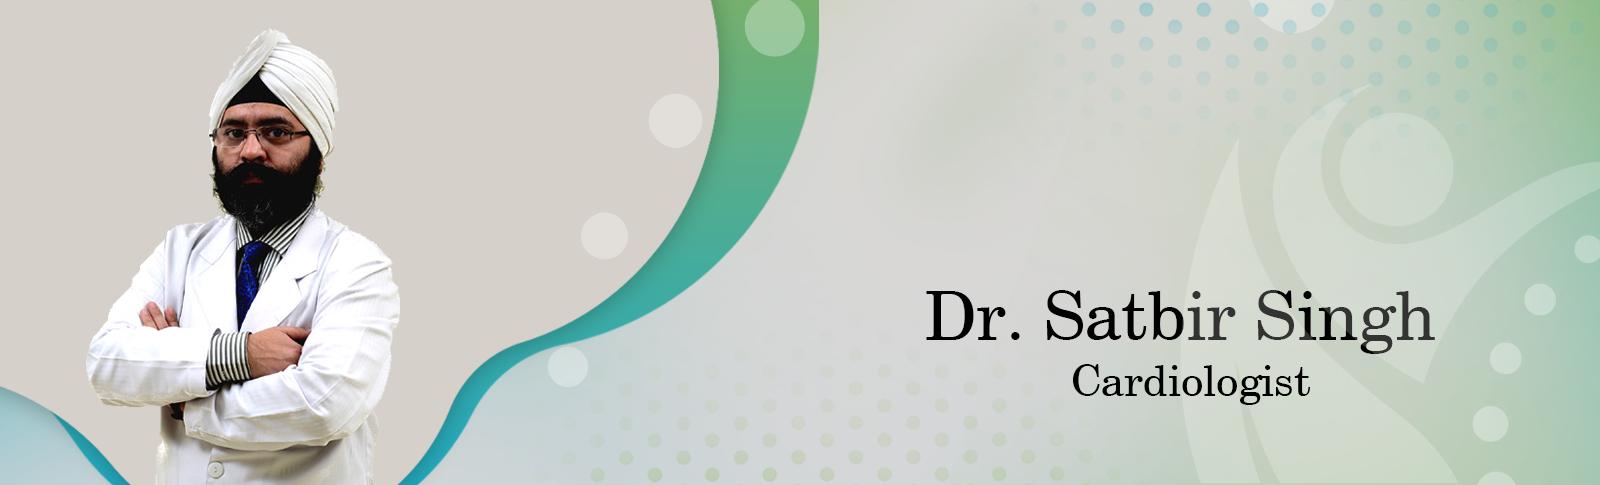 Dr. Satbir Singh